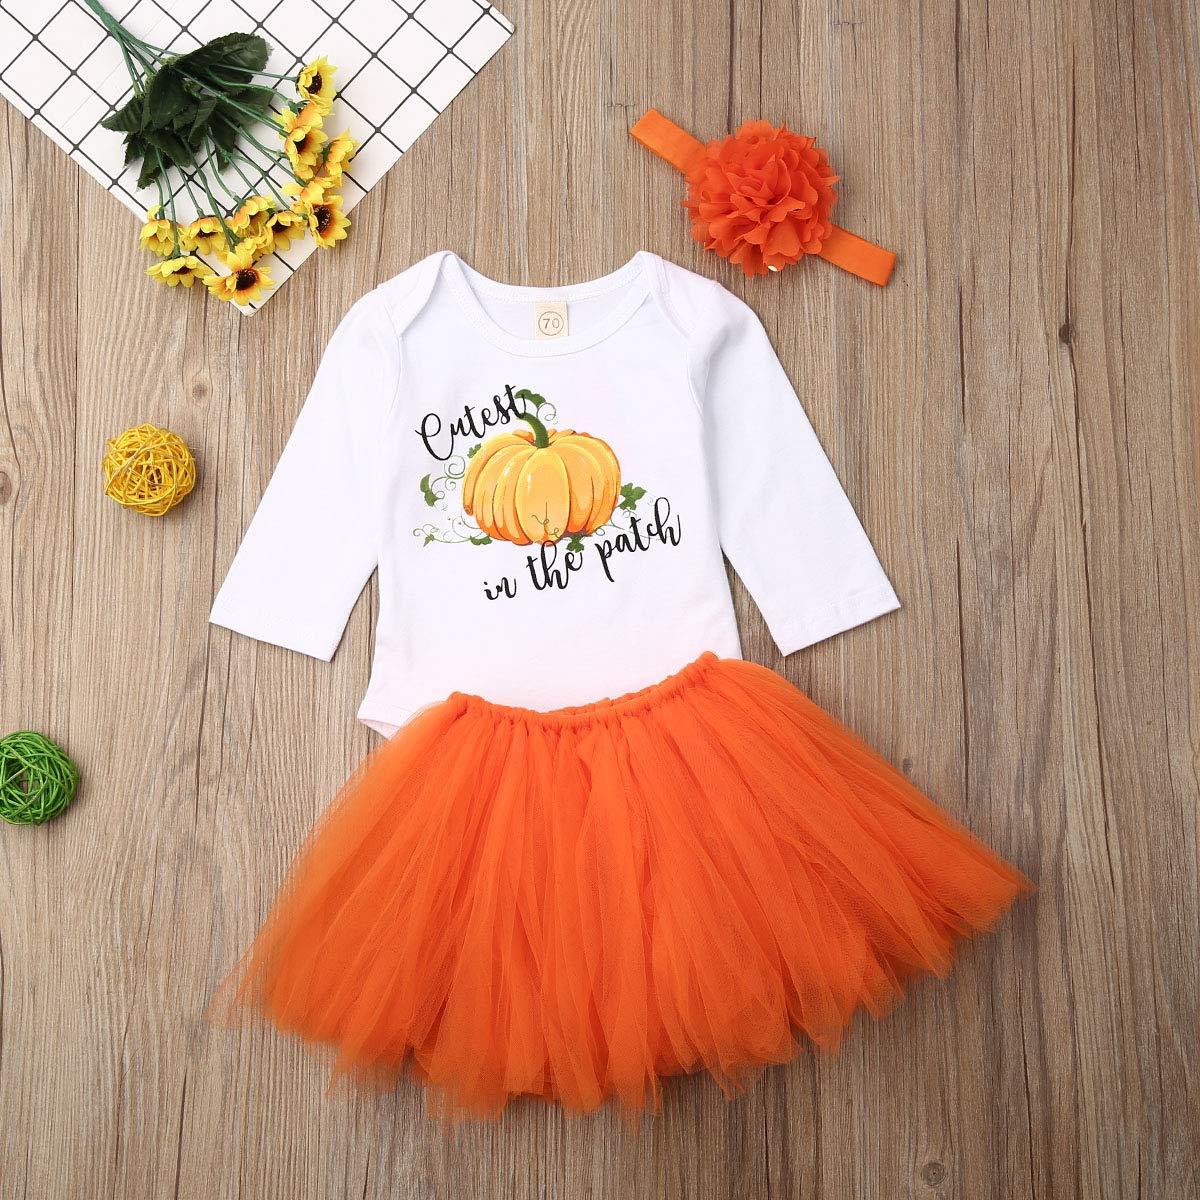 Baby Girl Halloween Outfits Newborn Pumpkin Romper Orange Tutu Skirt with Headband 3pcs Dress Set